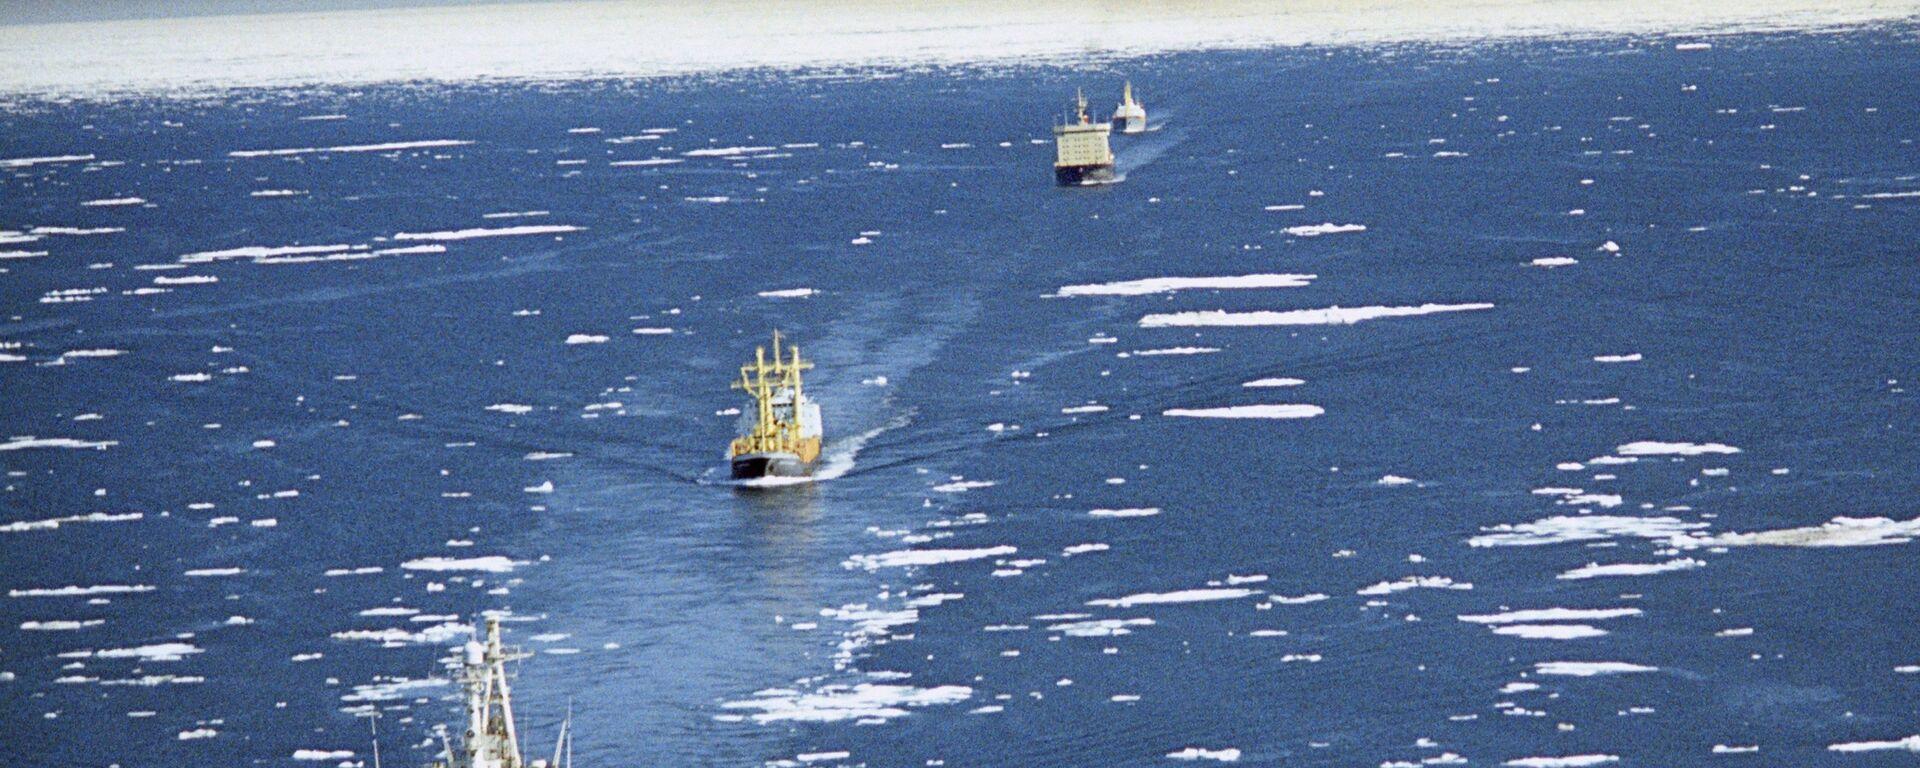 Караван судов на трассе Северного морского пути - Sputnik Mundo, 1920, 03.09.2021